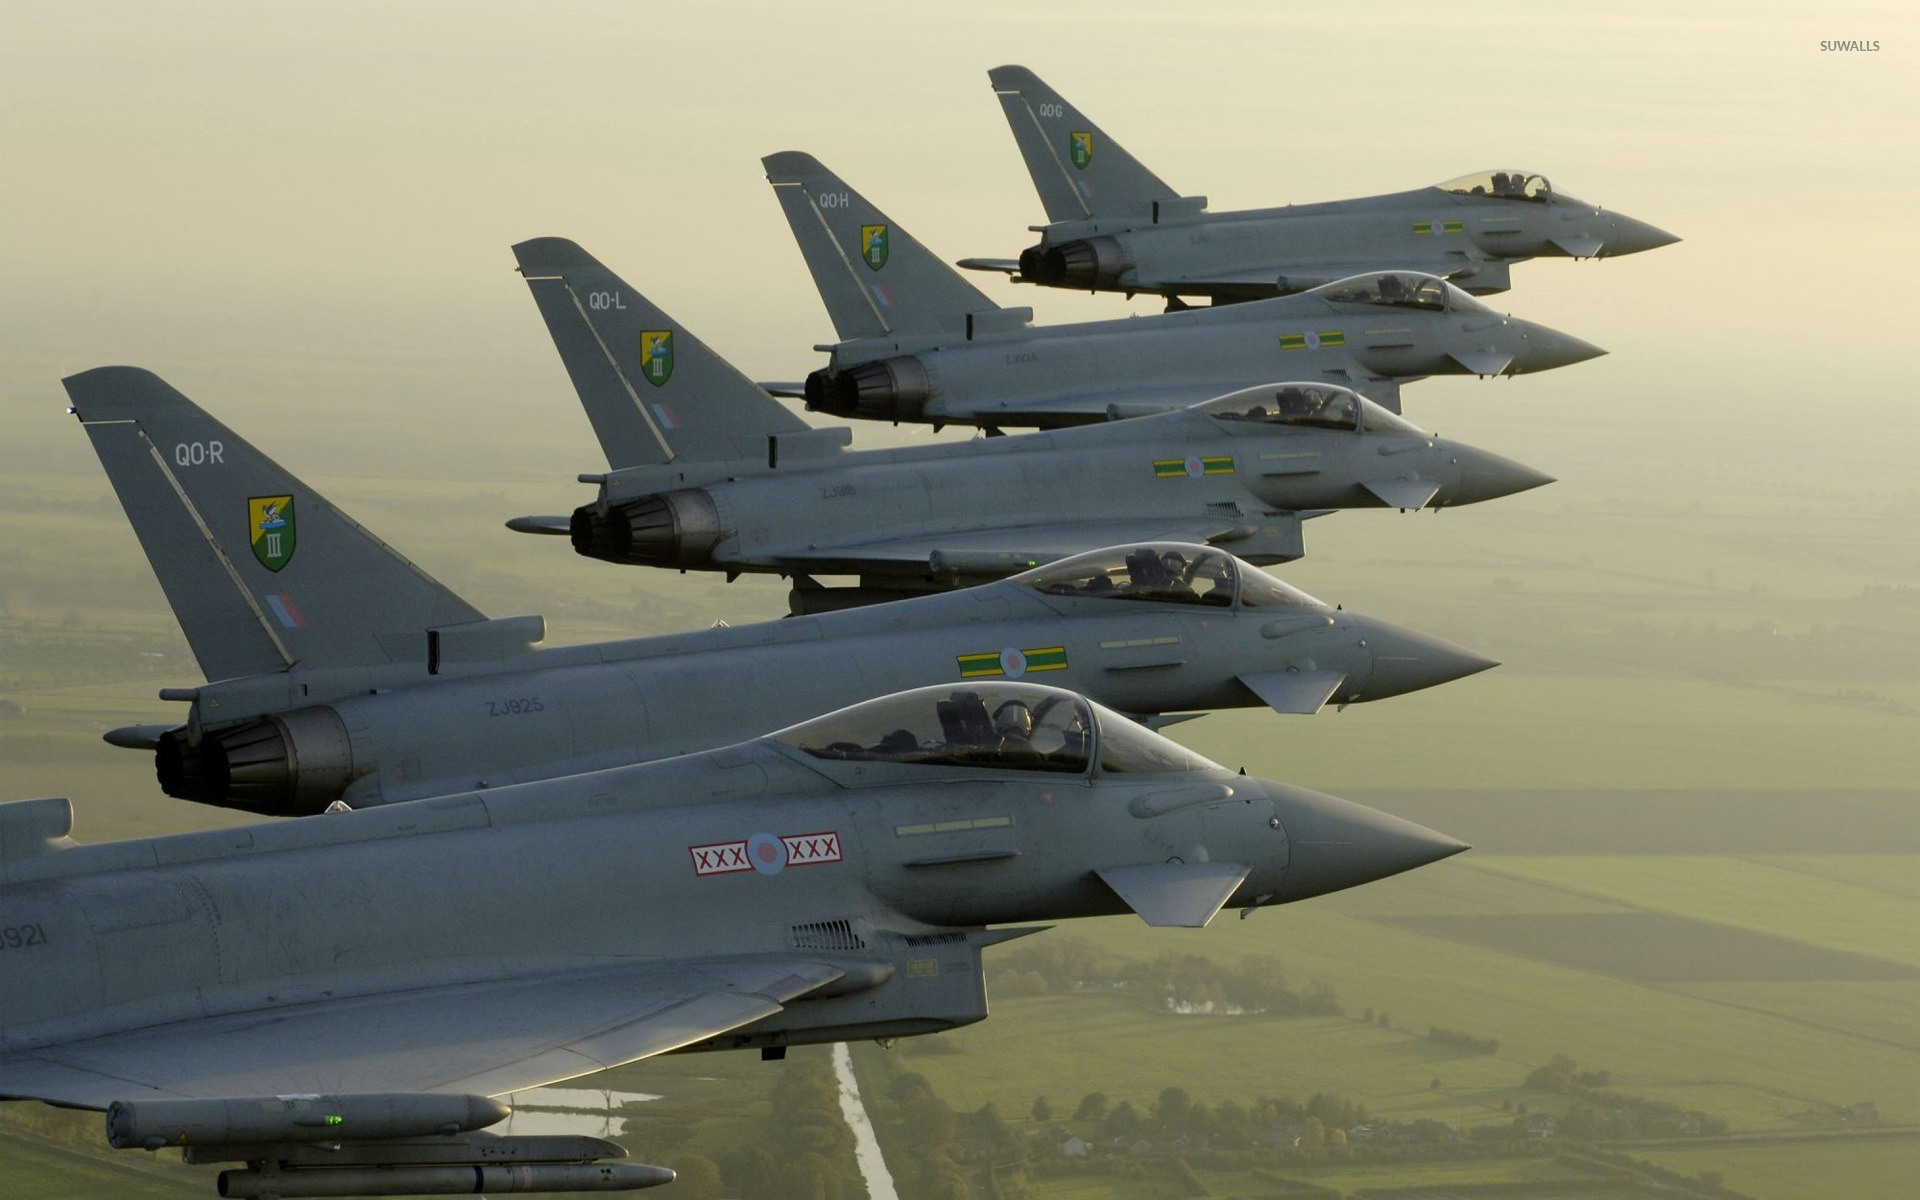 Qatarul va cumpăra 24 de avioane Typhoon